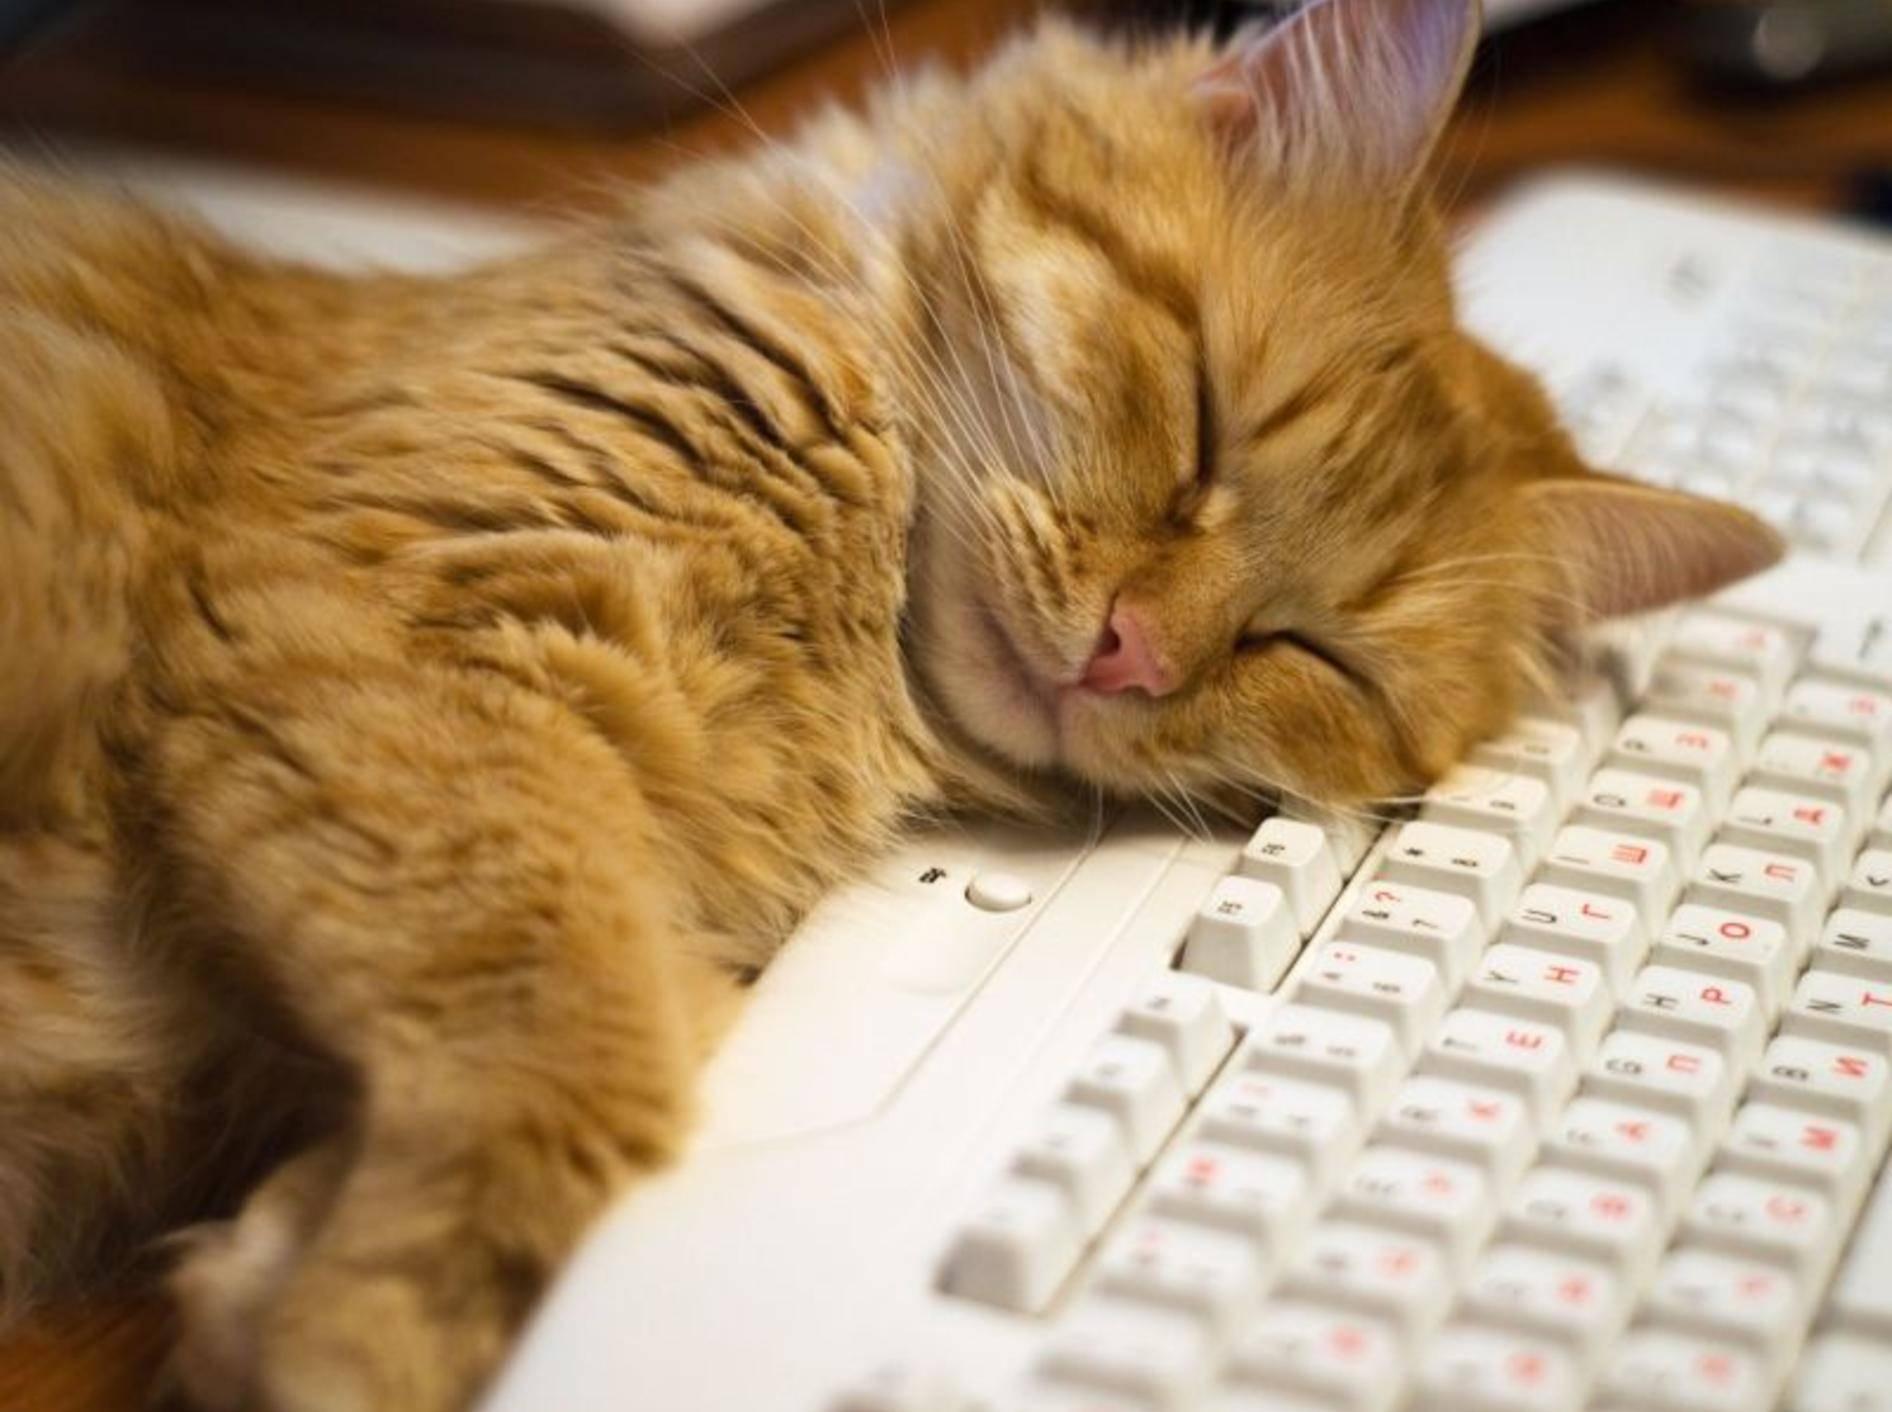 Roter Kater schläft am Computer